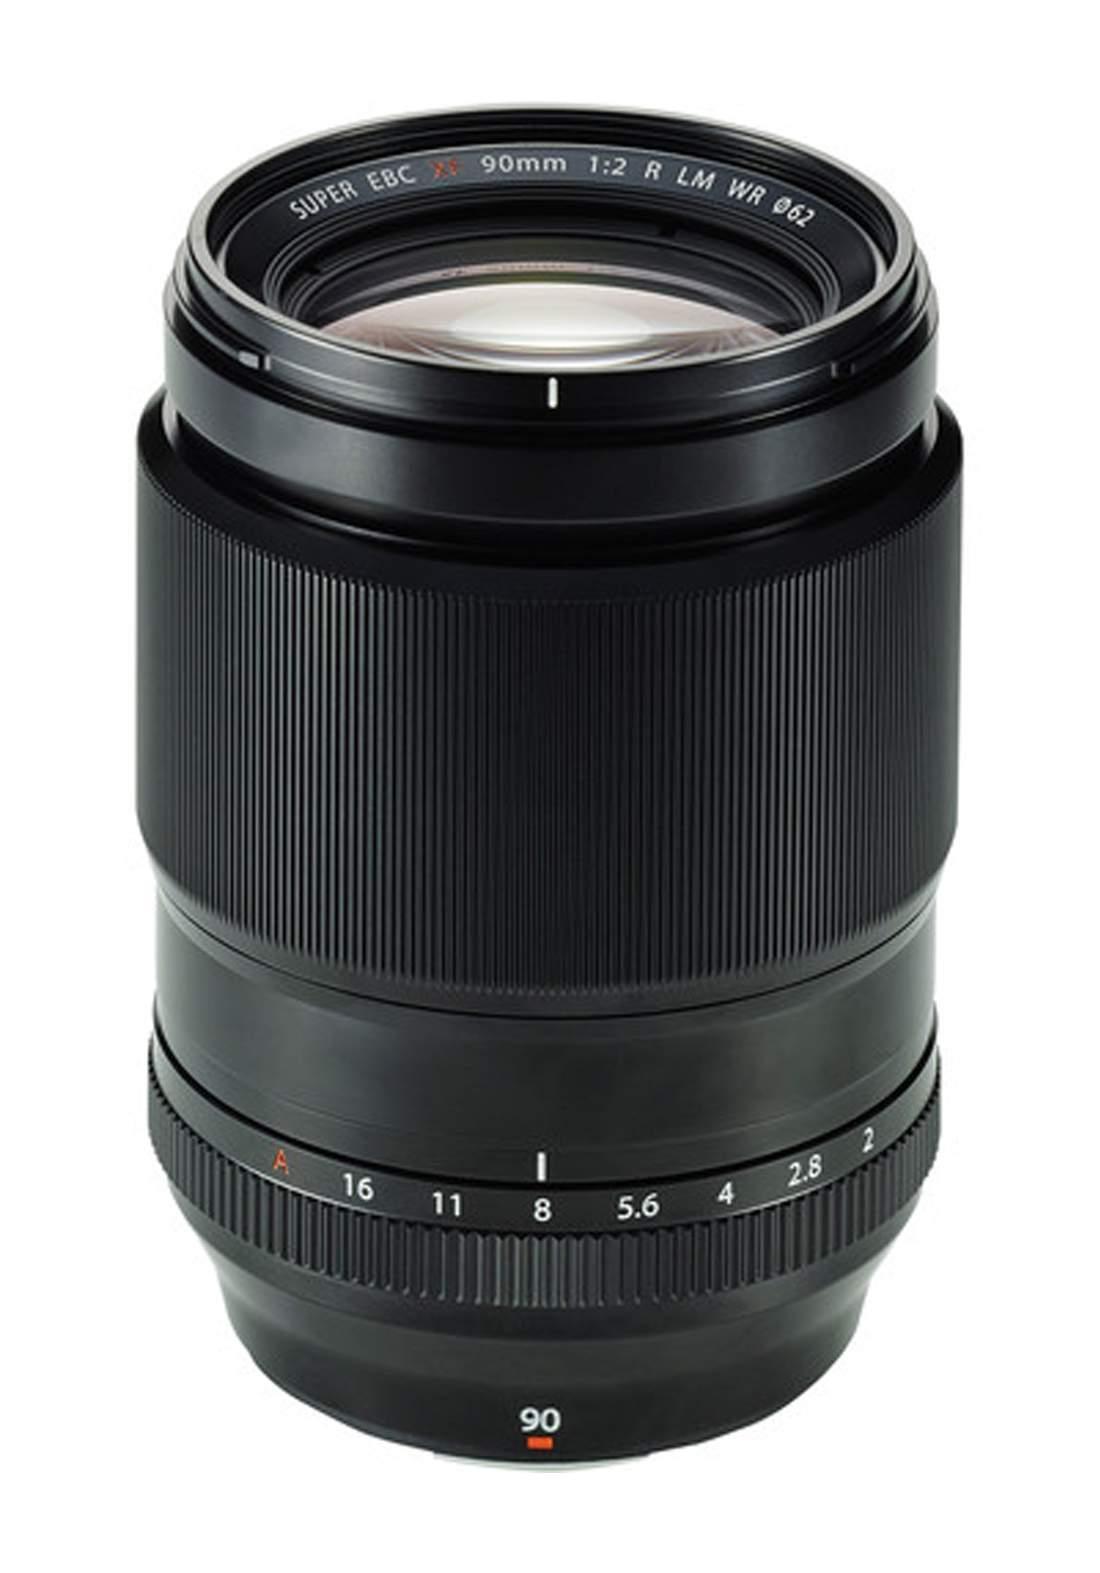 Fujifilm  XF 90mm F2 R LM WR Lens  - Black عدسة كاميرا